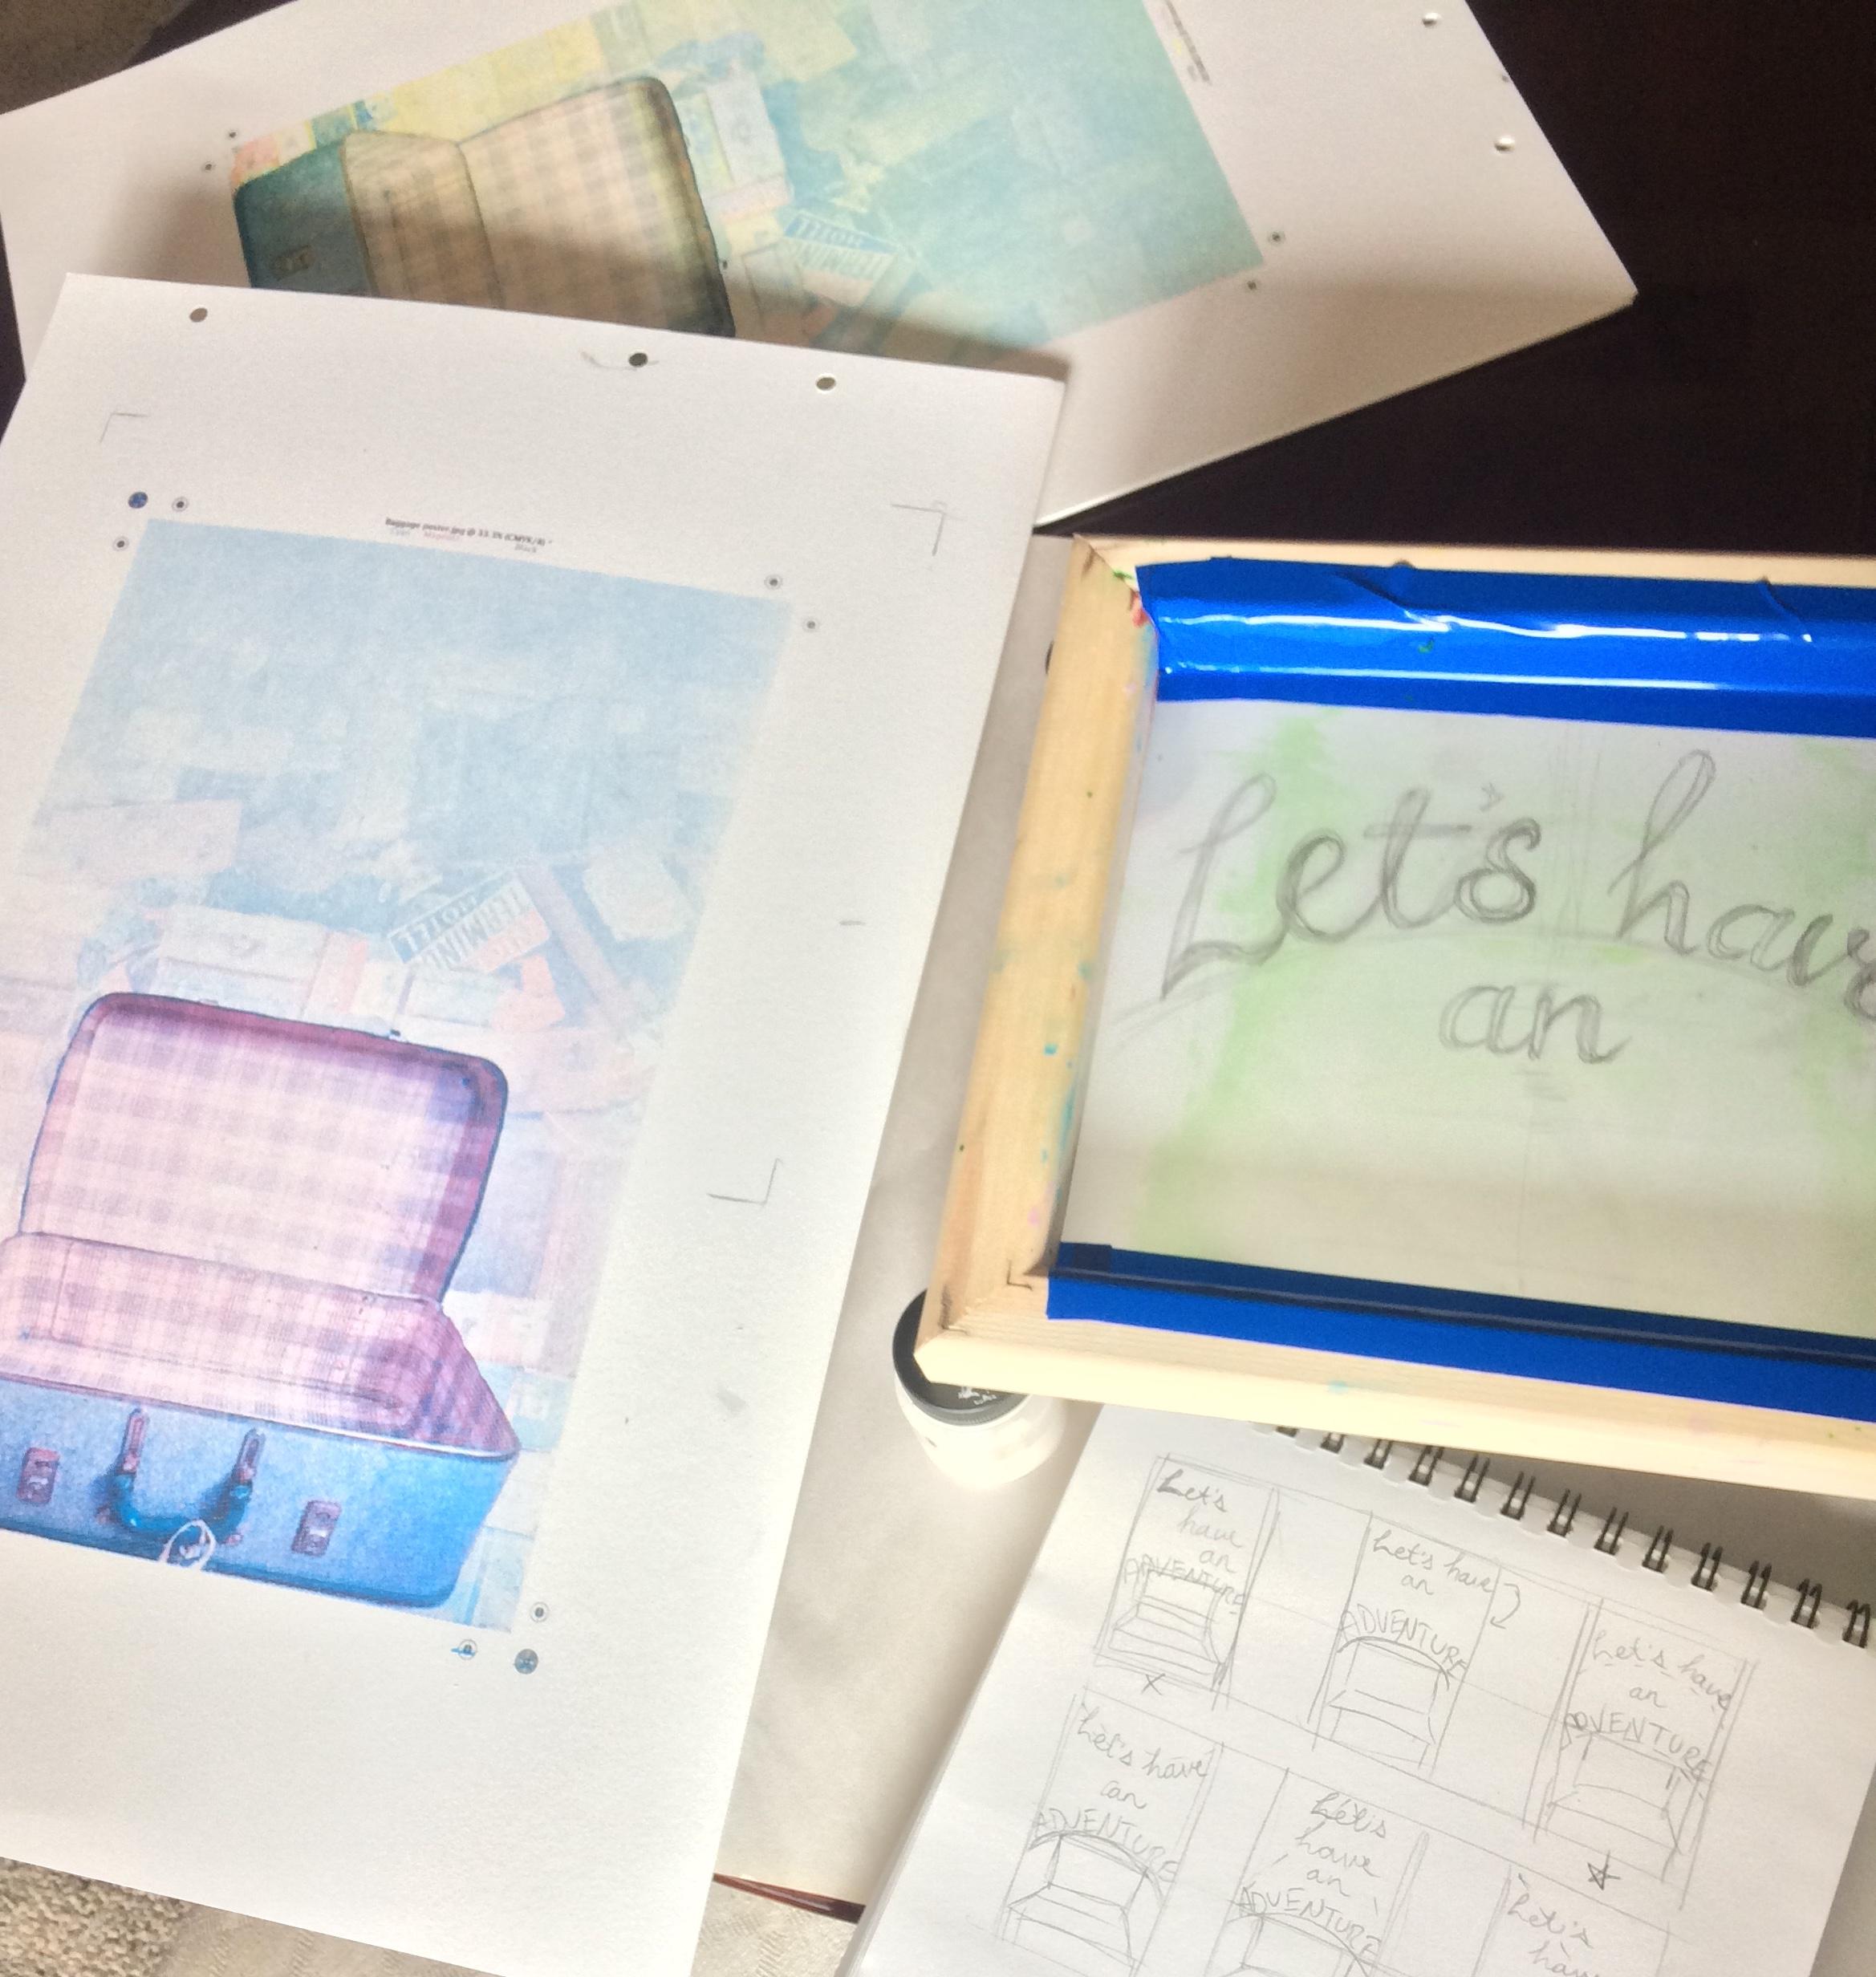 Process photo